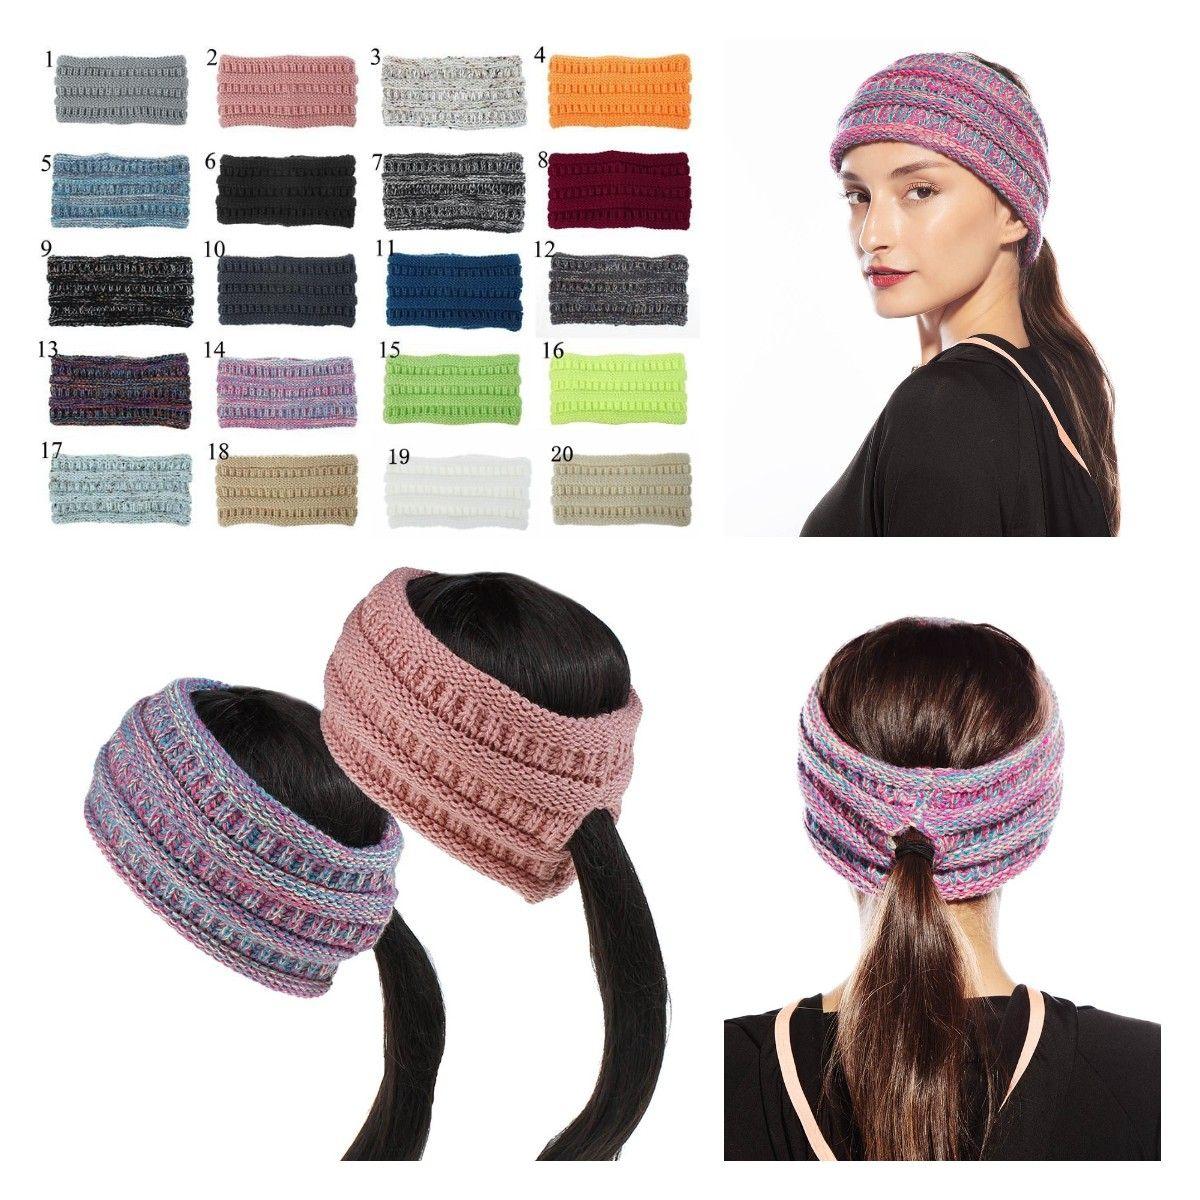 Blulu 3 Pieces Ponytail Headband Women Winter Headband Ear Warmer Running Headband for Women Girls Outdoor Sports 3 Colors